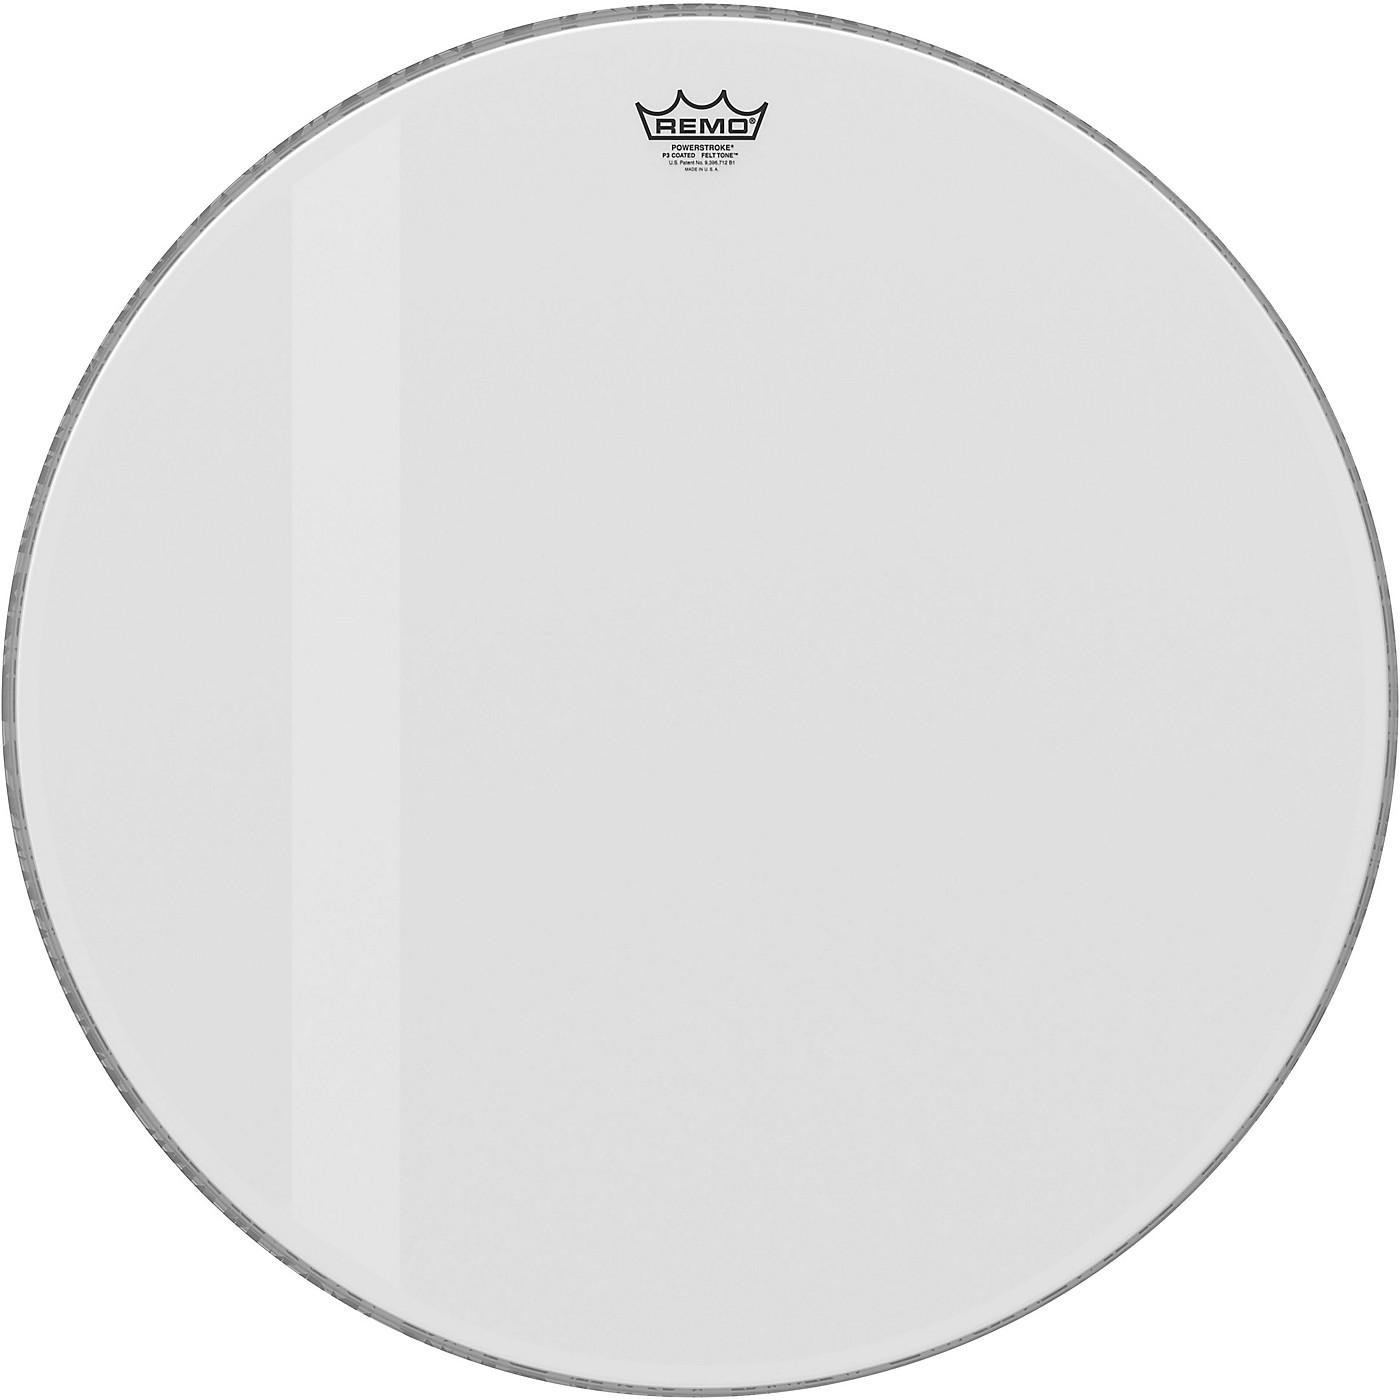 Remo Powerstroke P3 Felt Tone Coated Bass Drum Head thumbnail